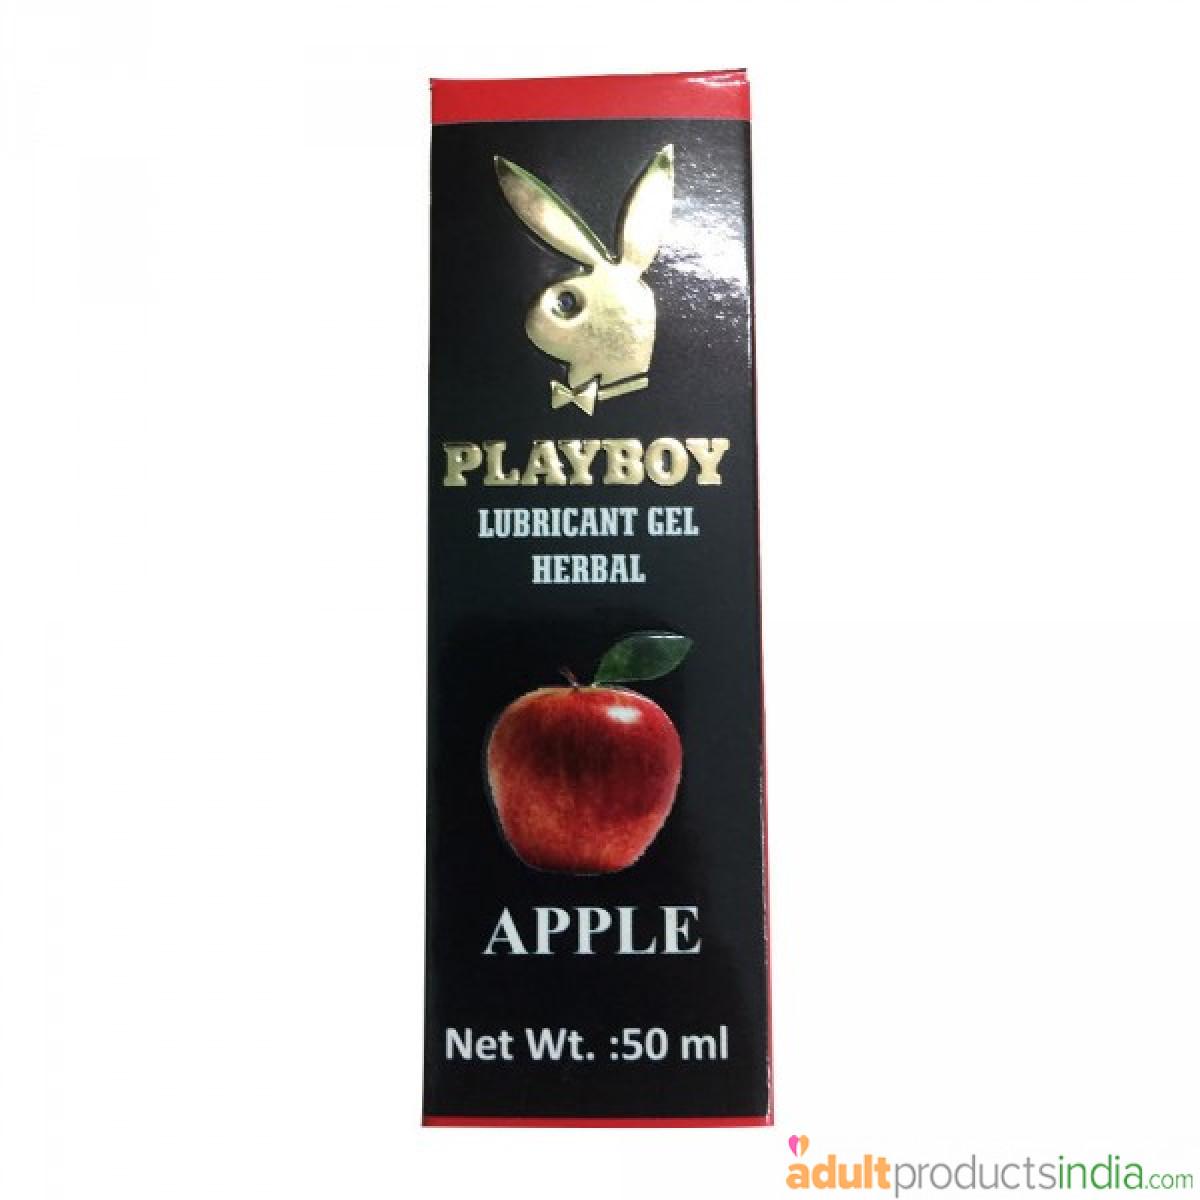 Playboy Lube - Apple